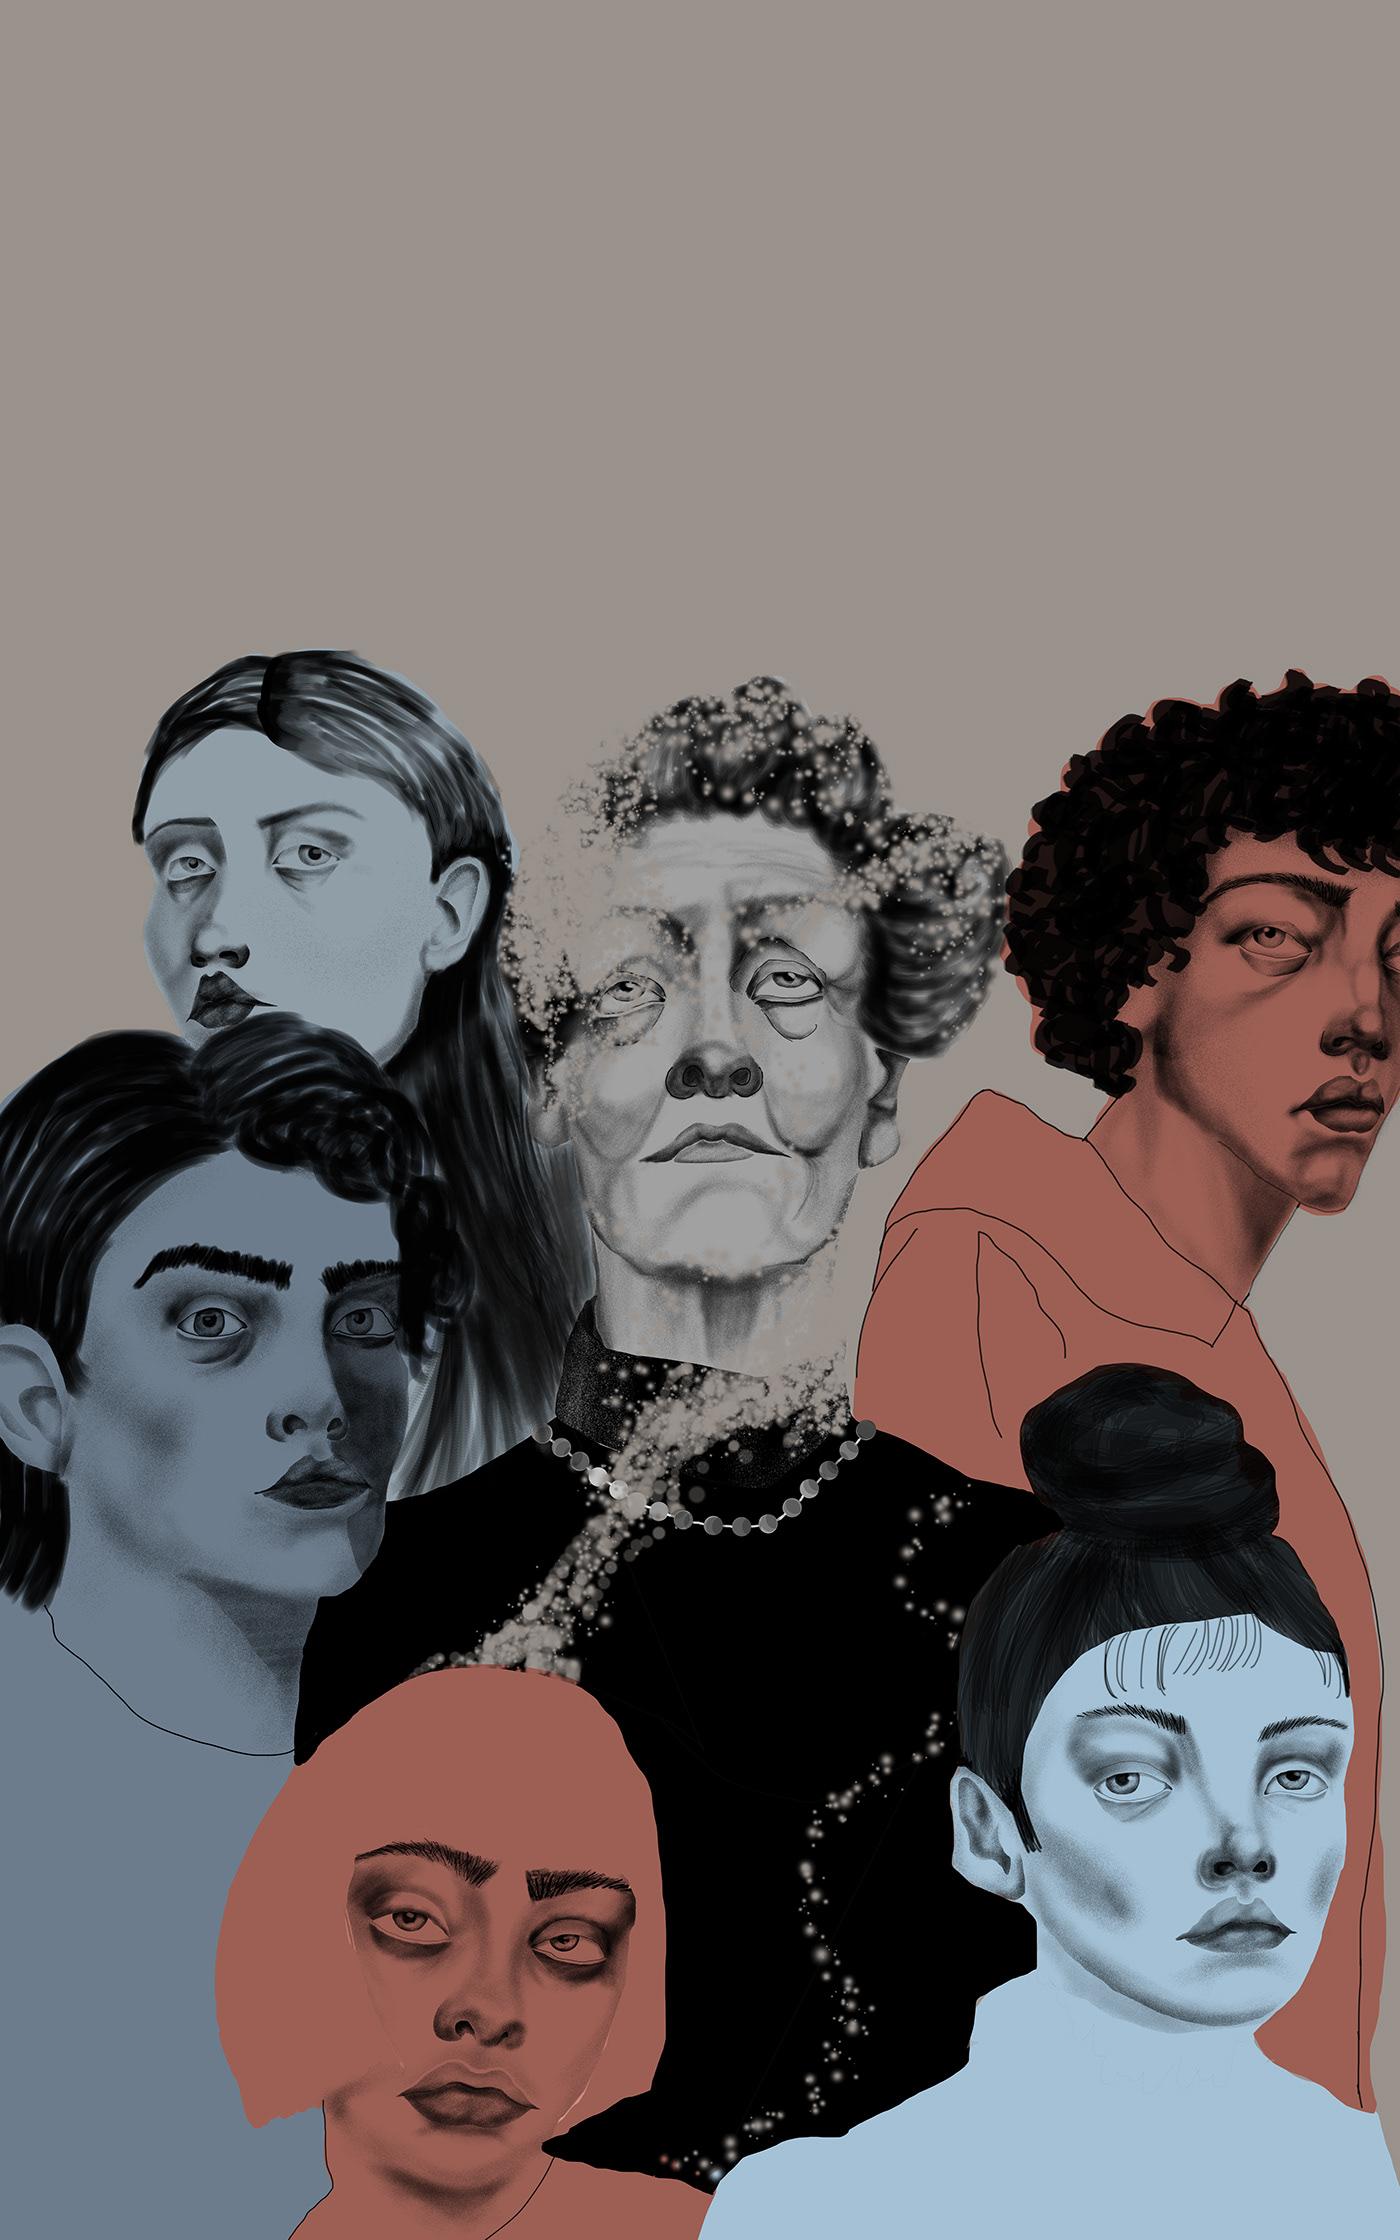 art conceptart digitalart Drawing  editorial ILLUSTRATION  magazine photoshop portrait sketch